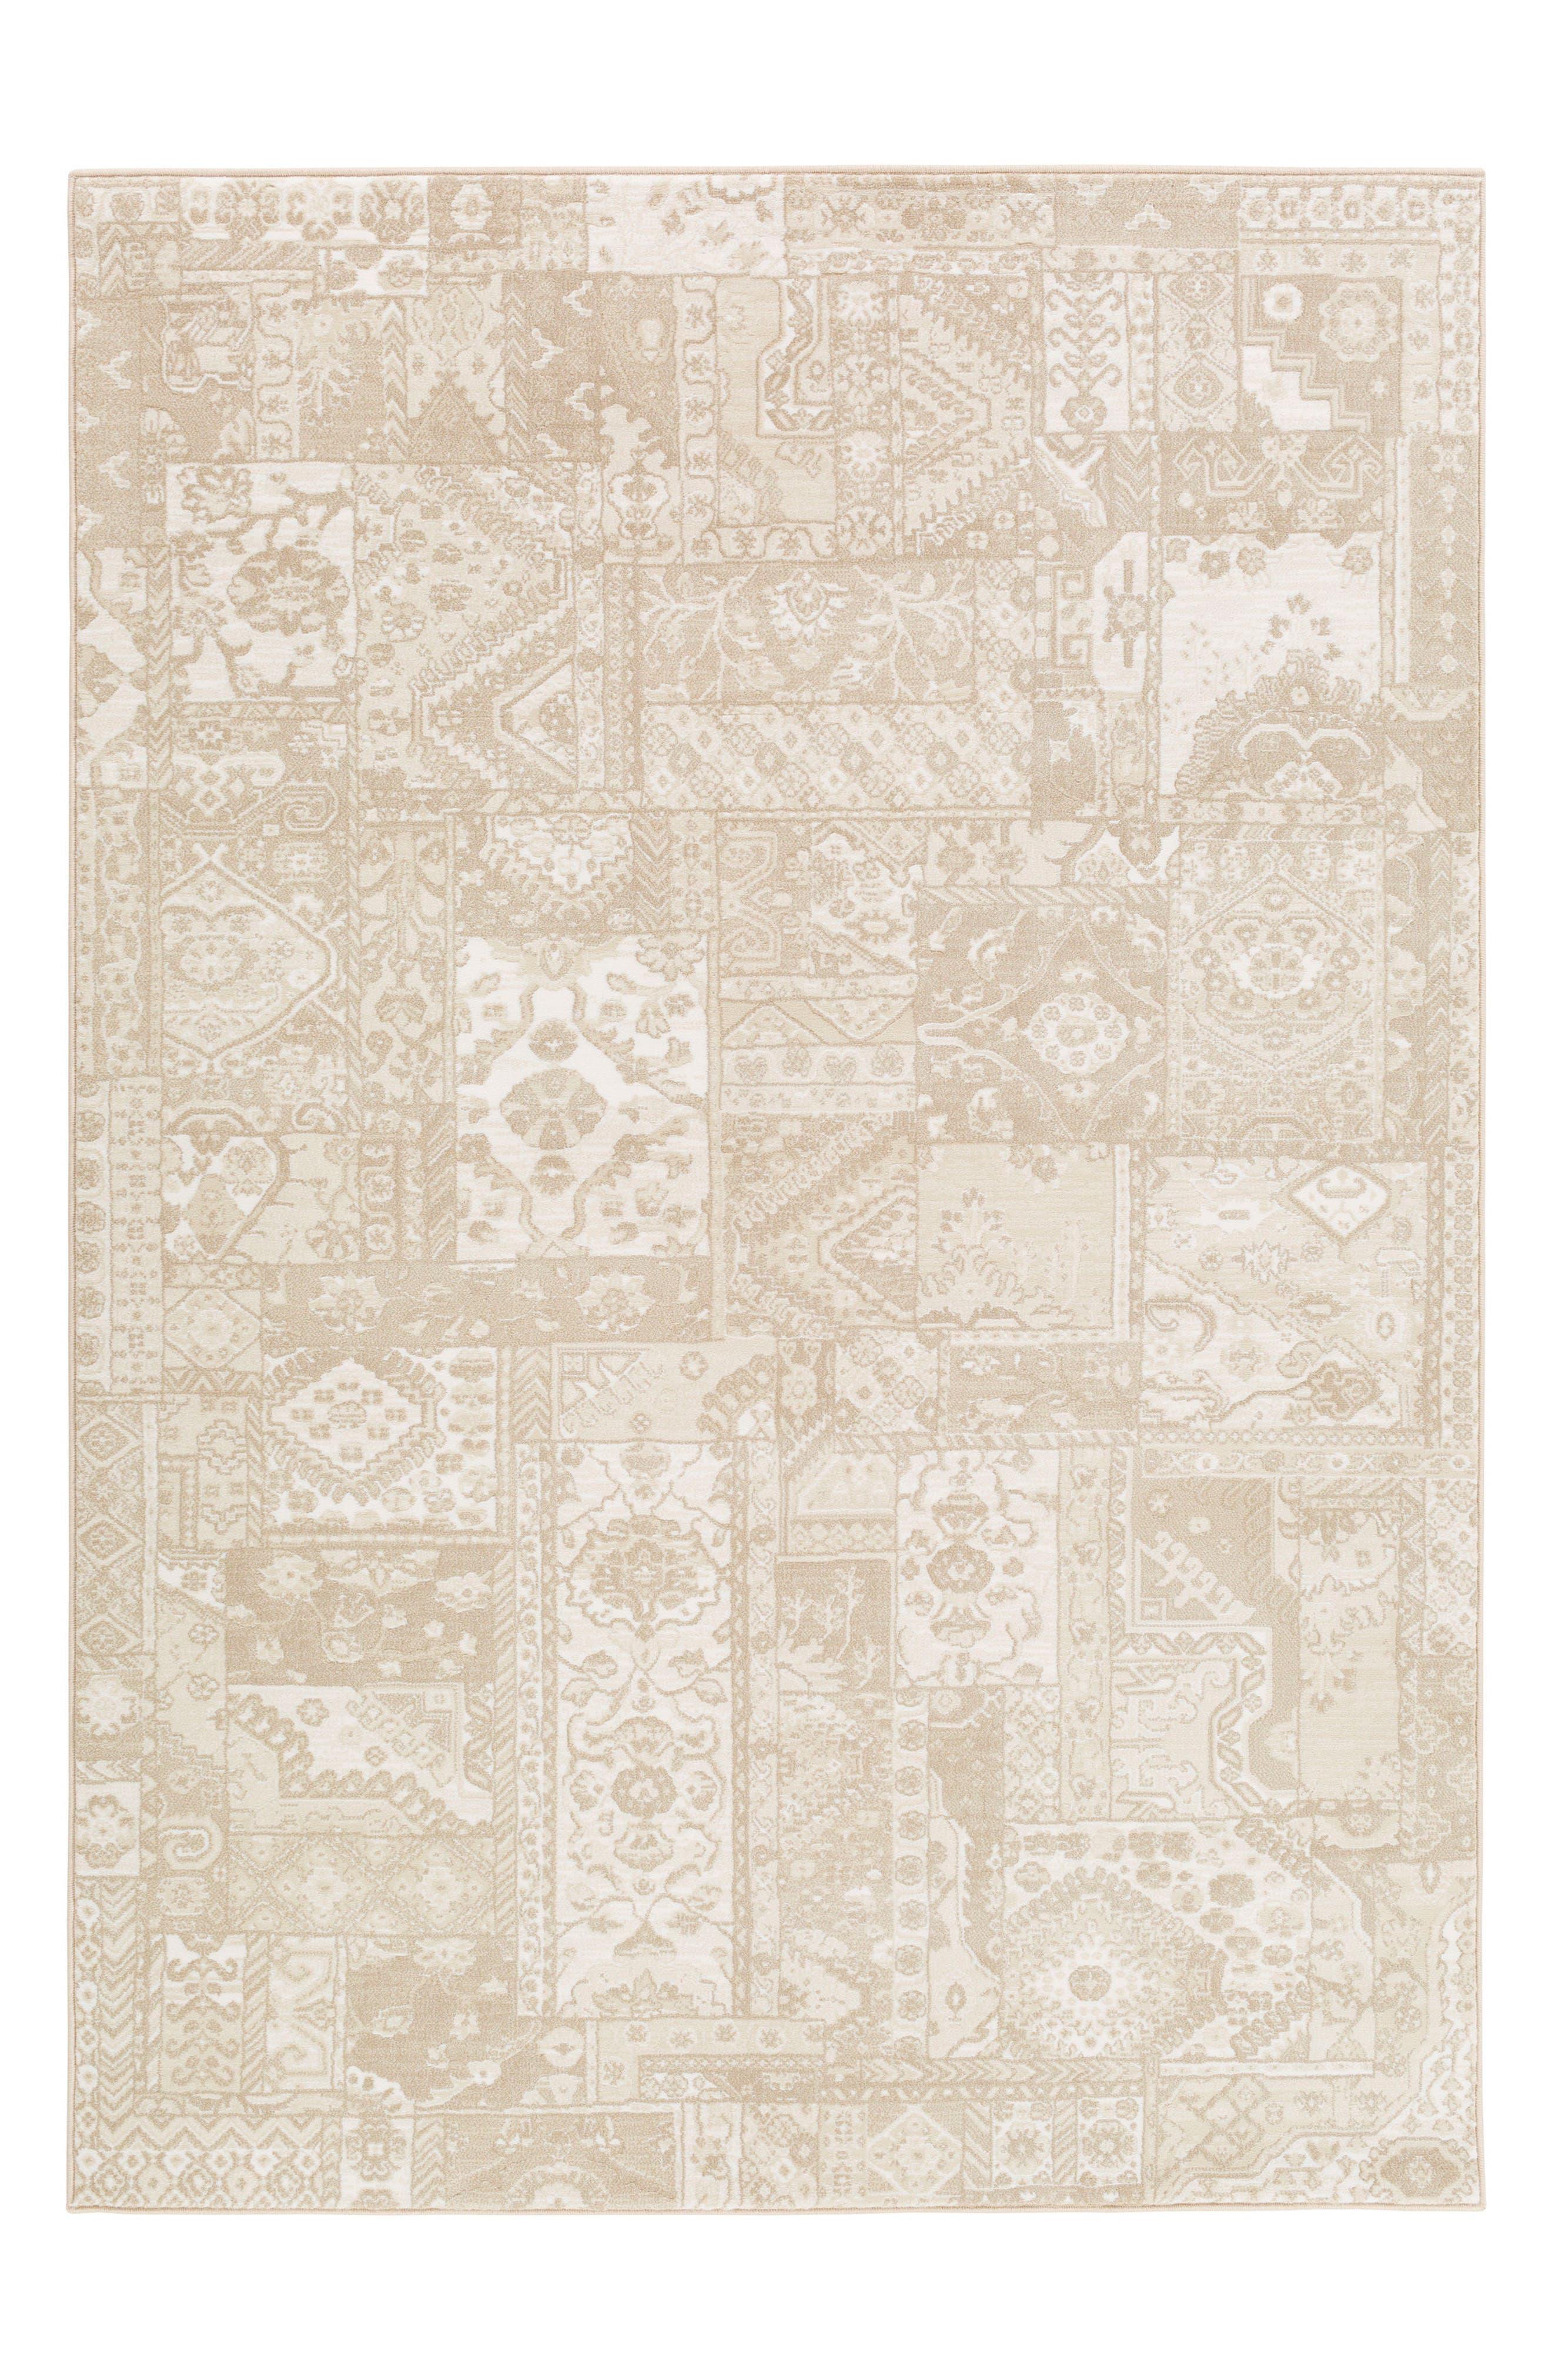 Alternate Image 1 Selected - Surya Home Classic Geometric Rug